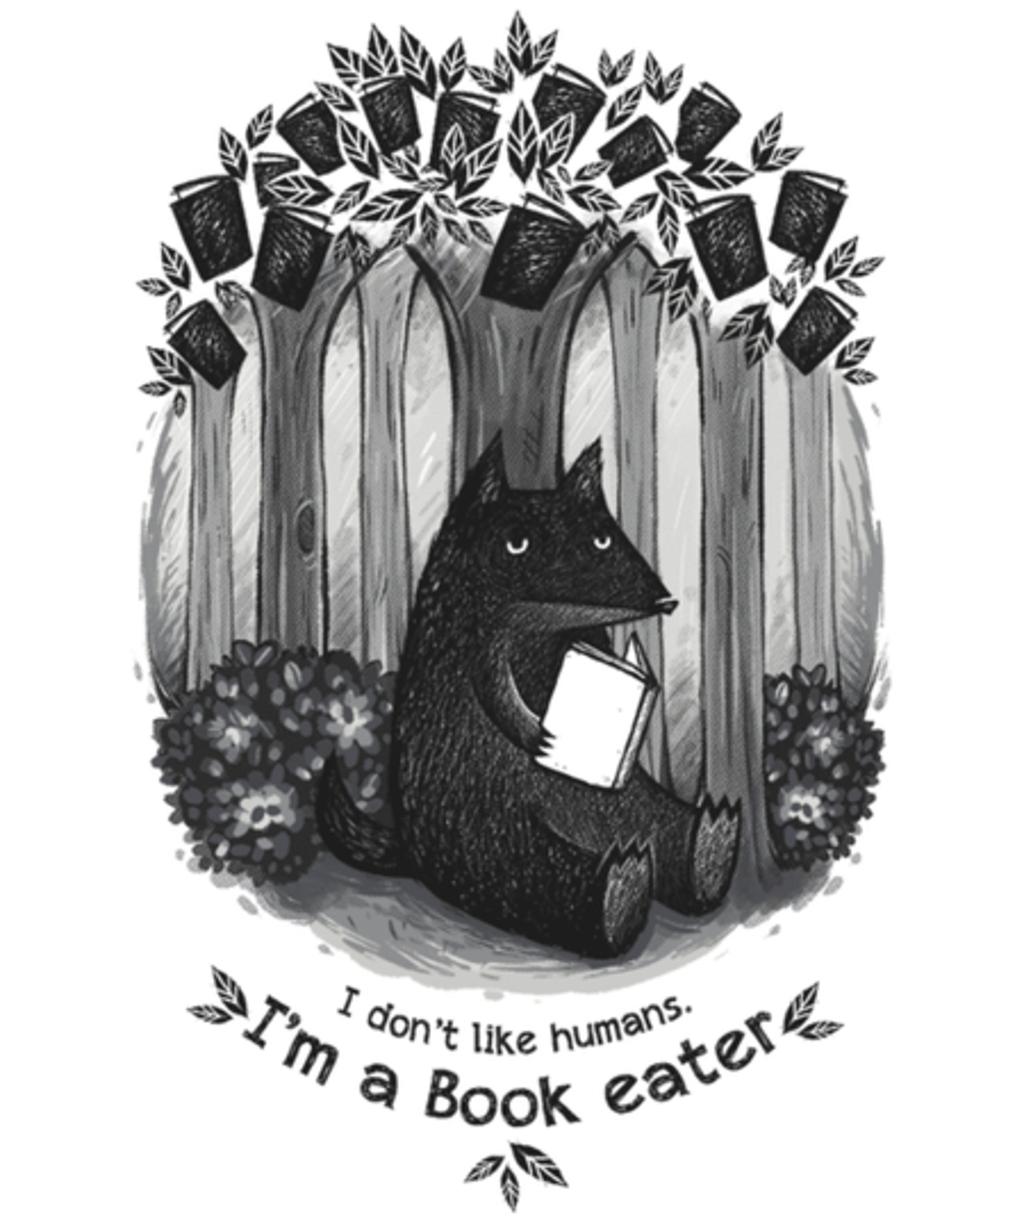 Qwertee: Book eater, please.